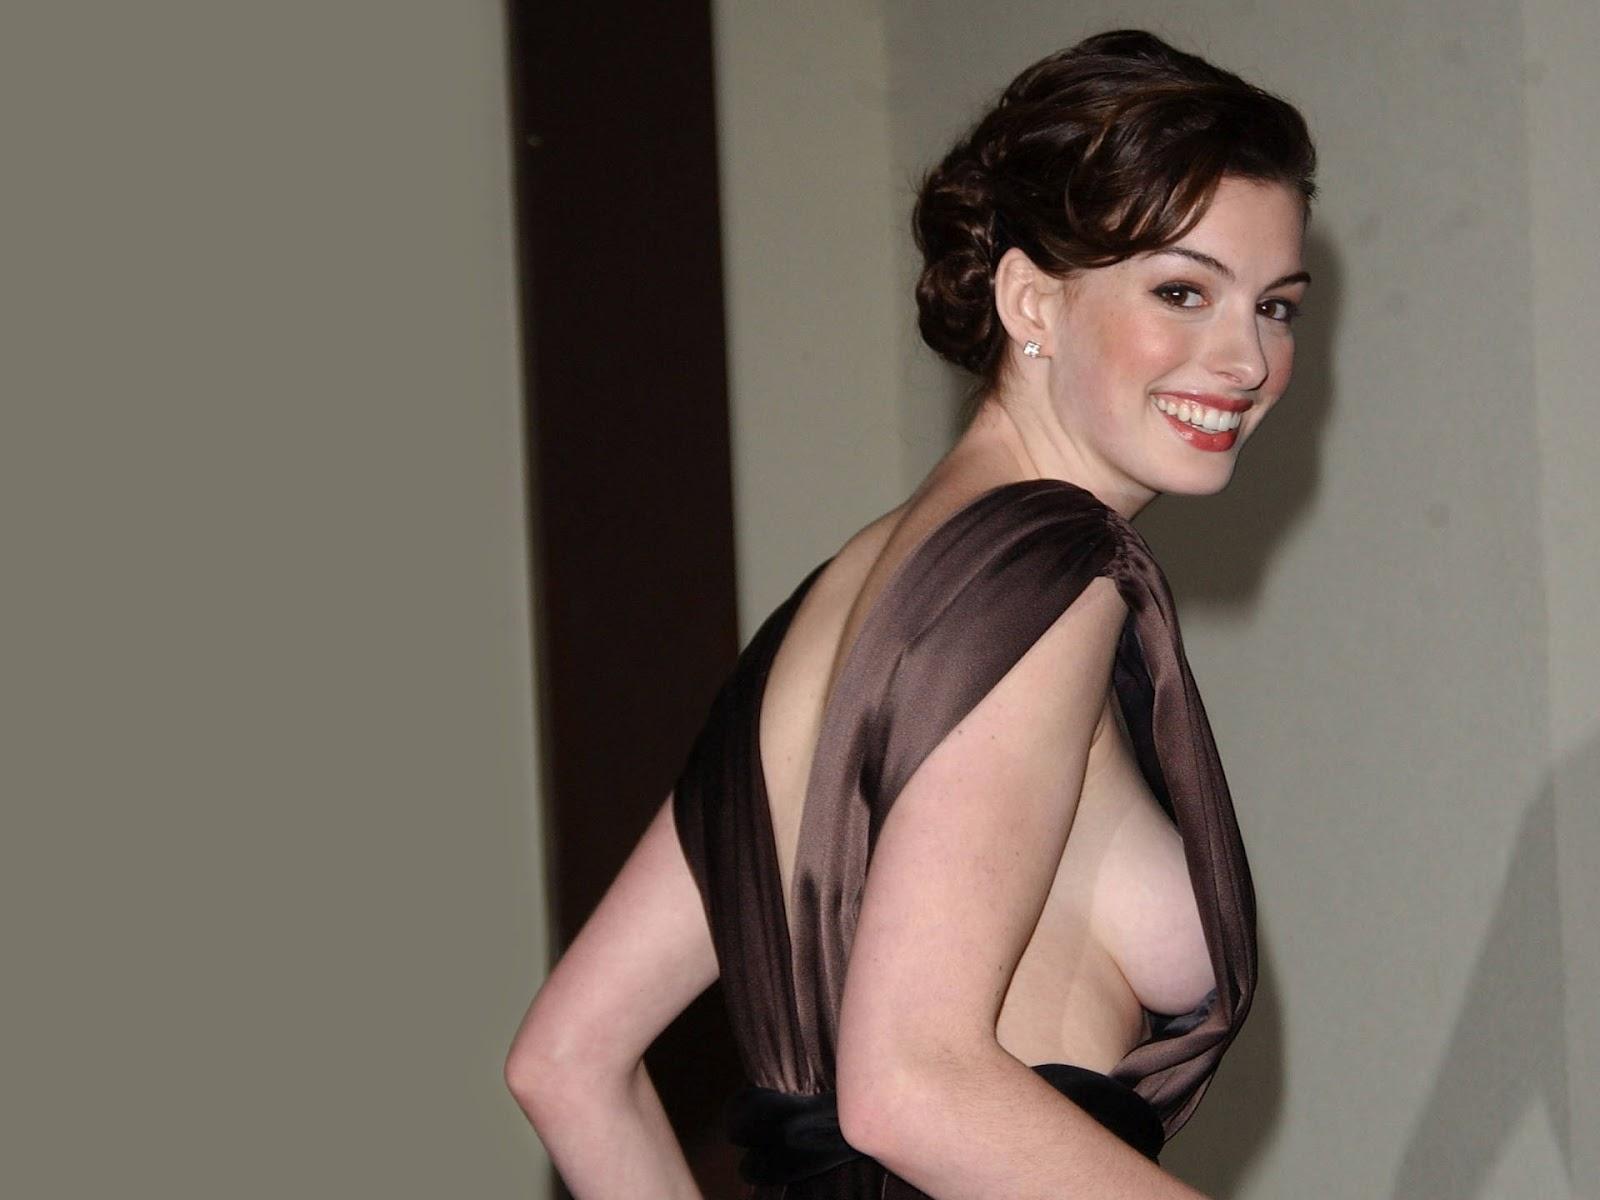 http://4.bp.blogspot.com/-Dg2J7YK4lVc/T-YBgPoSoTI/AAAAAAAAFXk/gAKpDTeIGGM/s1600/Anne-Hathaway+-+HotWallpaper+(2).jpg